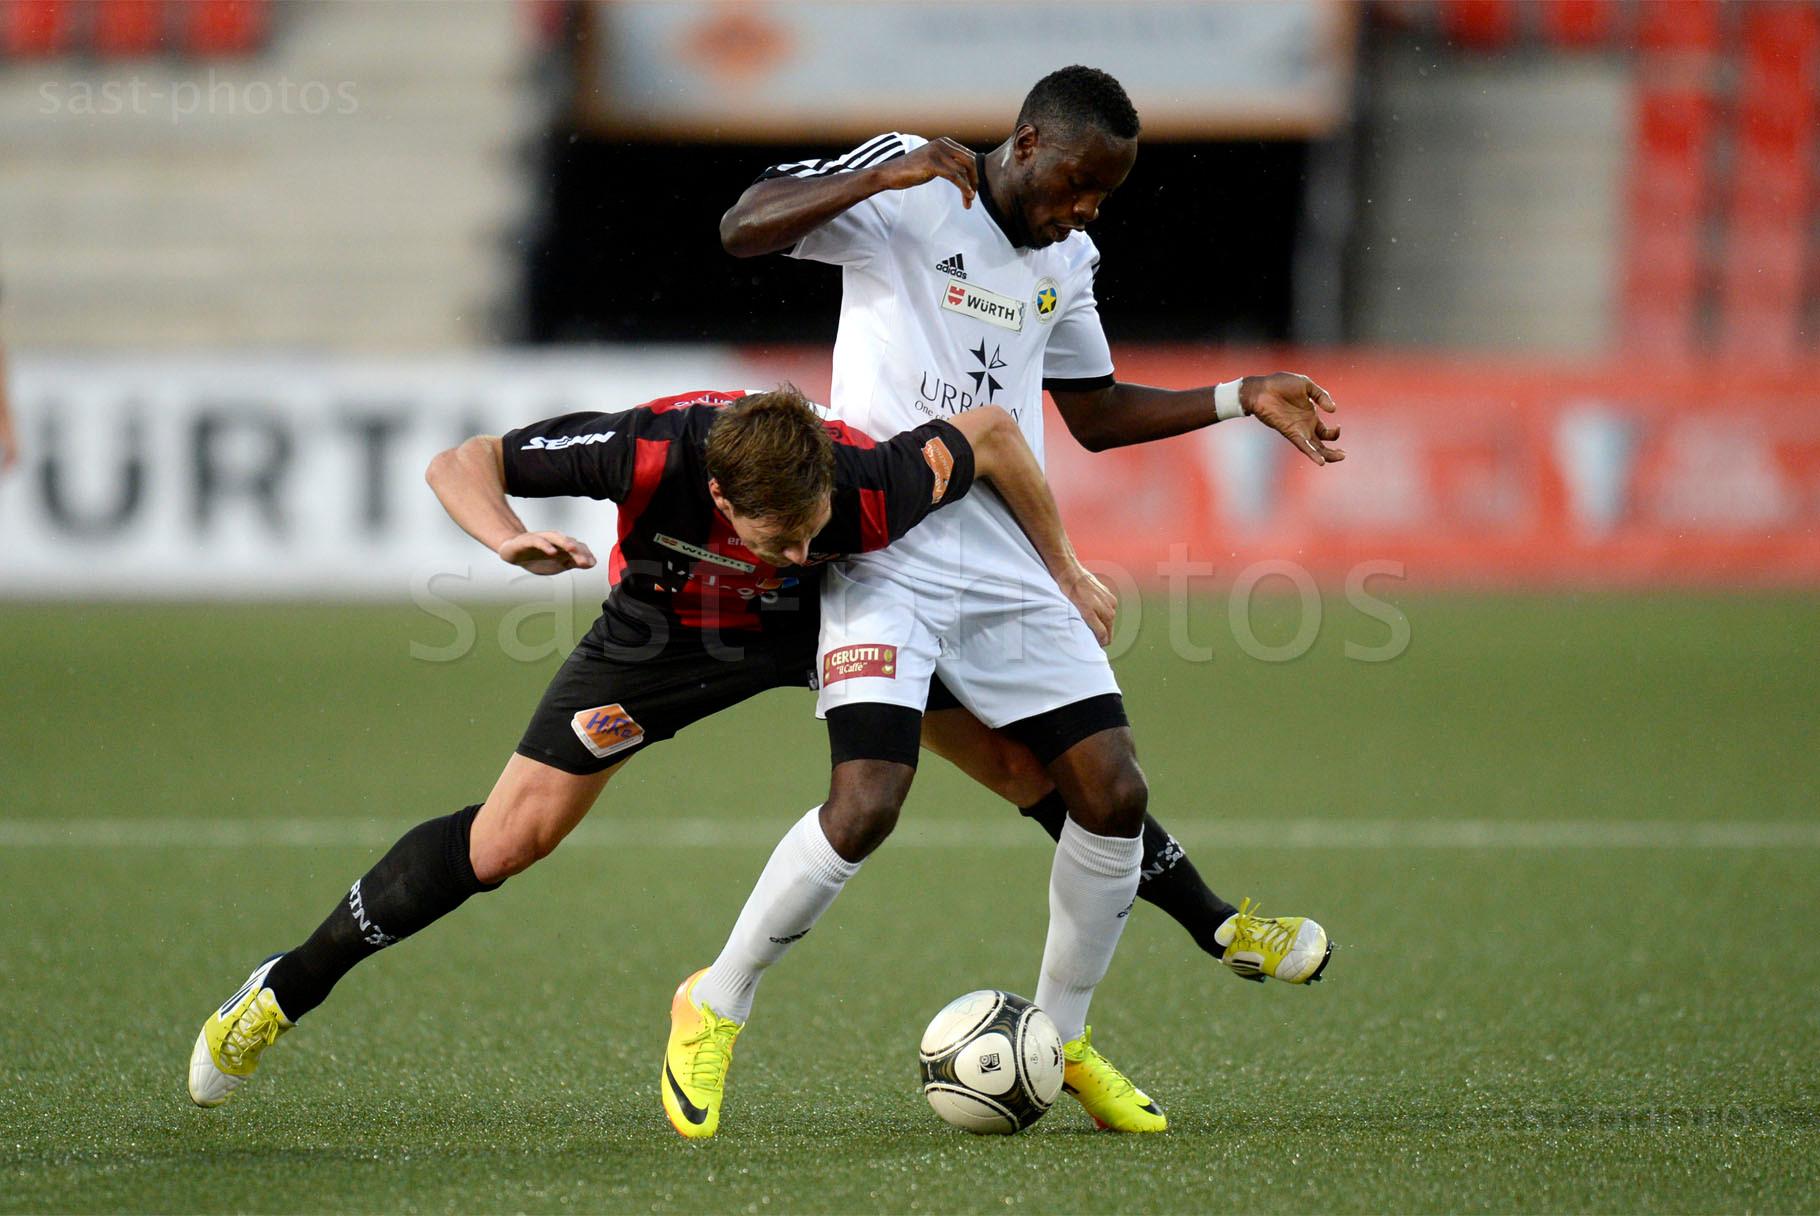 Charles-Andre Doudin (L. Xamax FCS) gegen Milton Kusunga (Carouge)